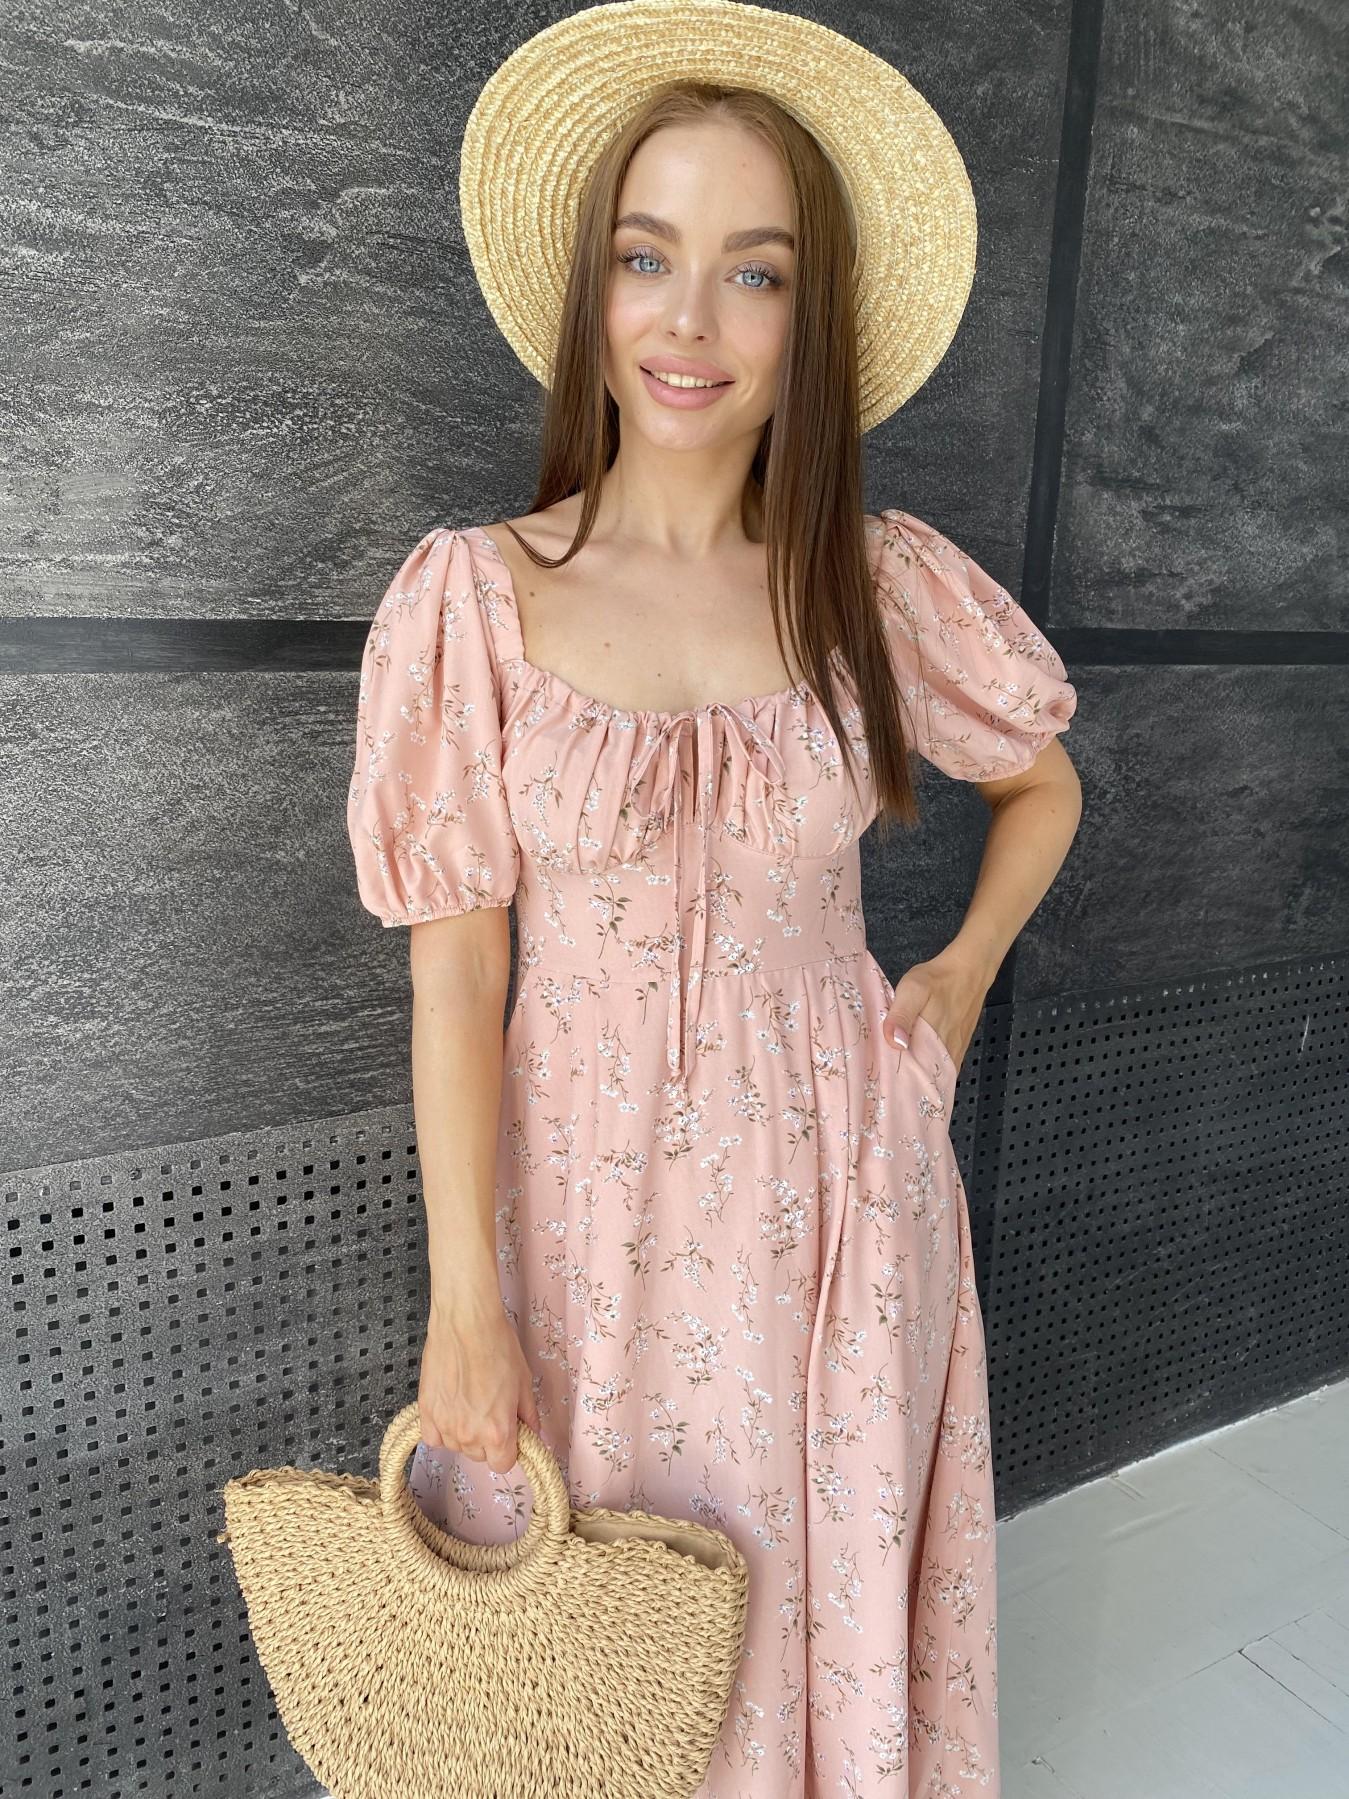 Кисес Миди платье из софт ткани в принт 11348 АРТ. 48150 Цвет: Пудра/букетики/бел/зел - фото 1, интернет магазин tm-modus.ru